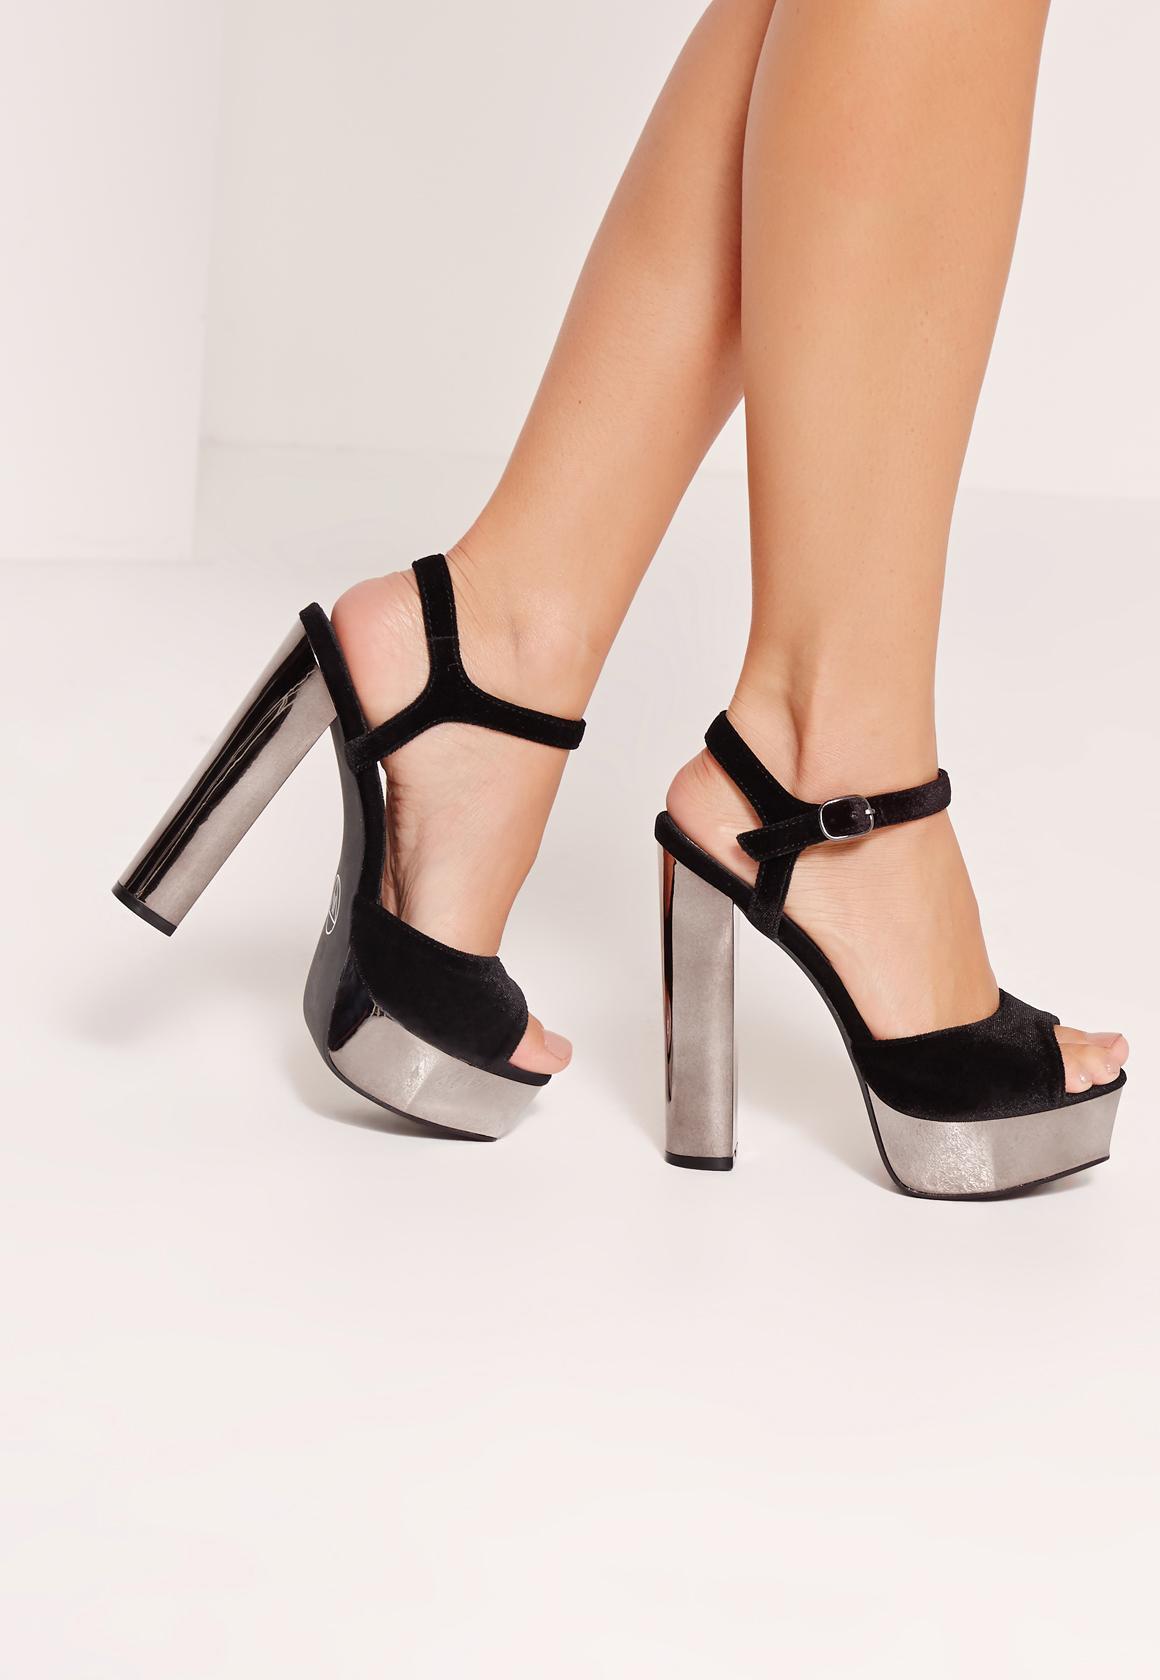 Black sandals missguided - Velvet Strap Metallic Platform Sandals Black Previous Next